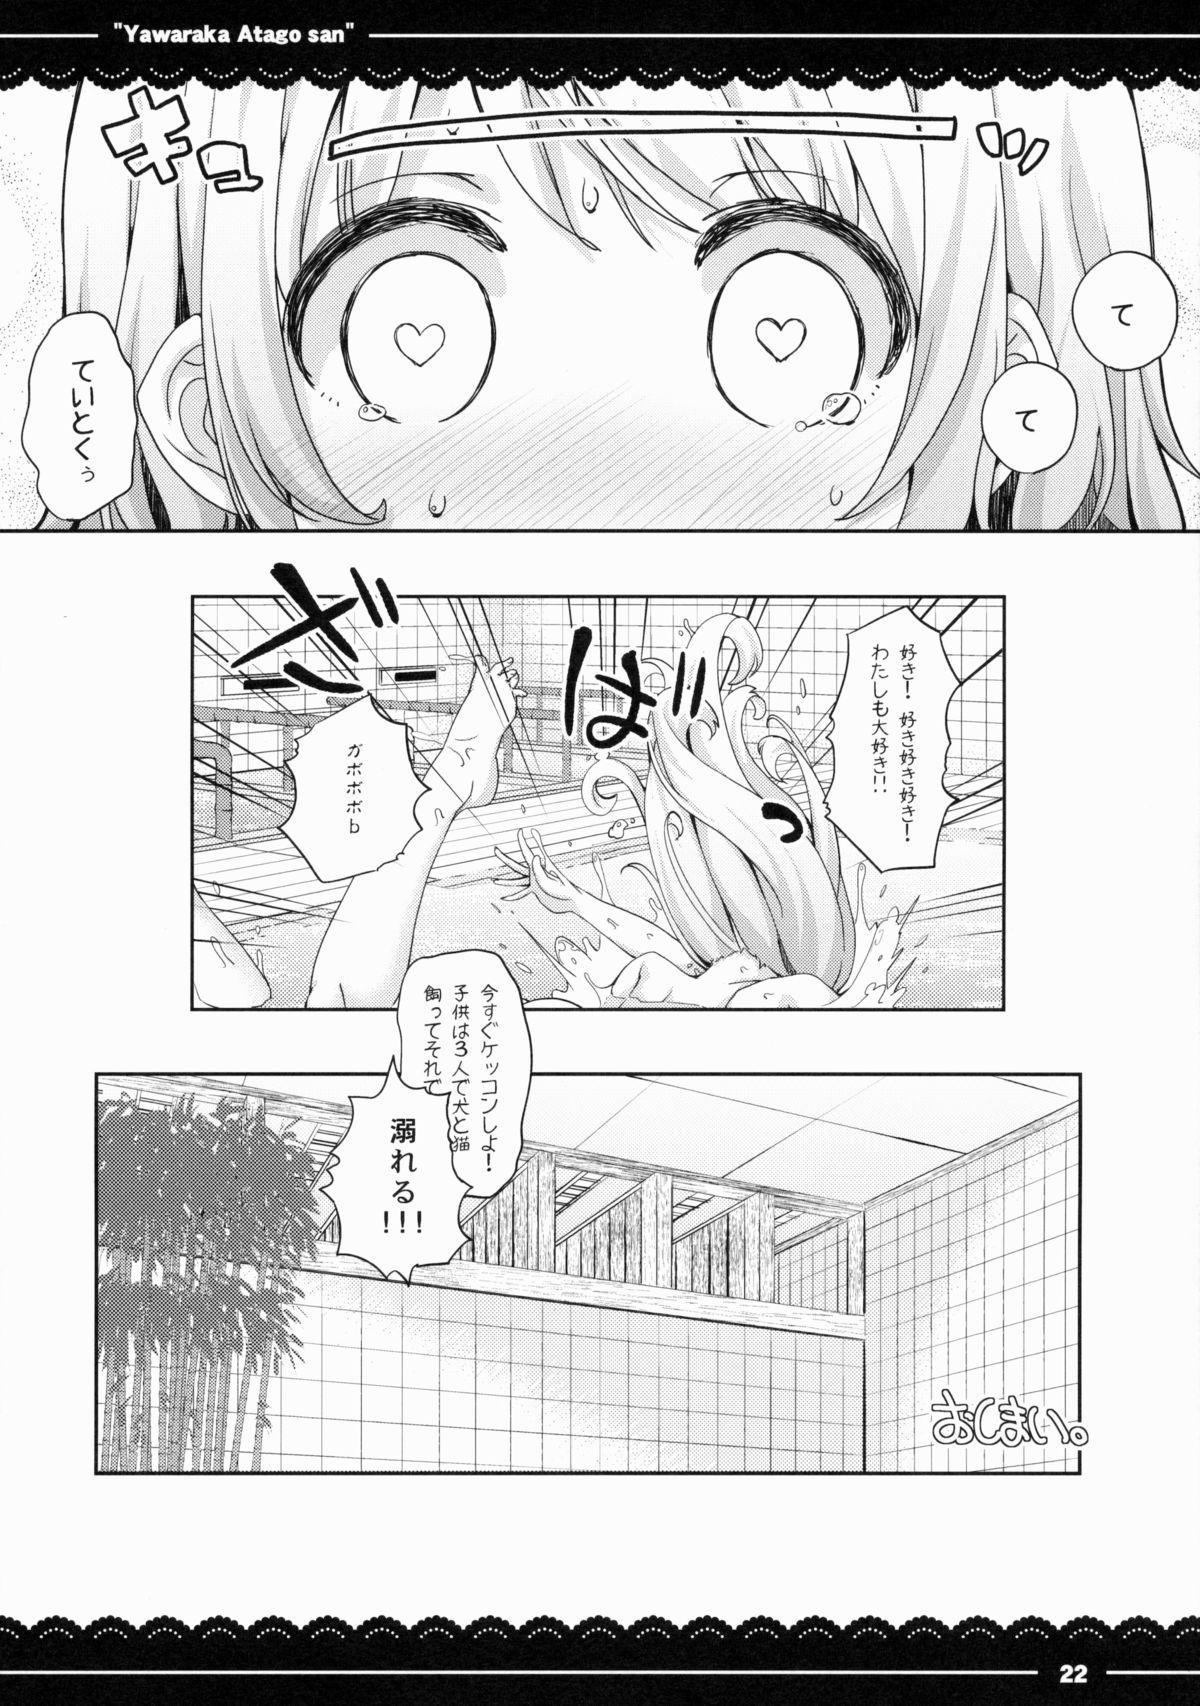 Yawaraka Atago-san 22